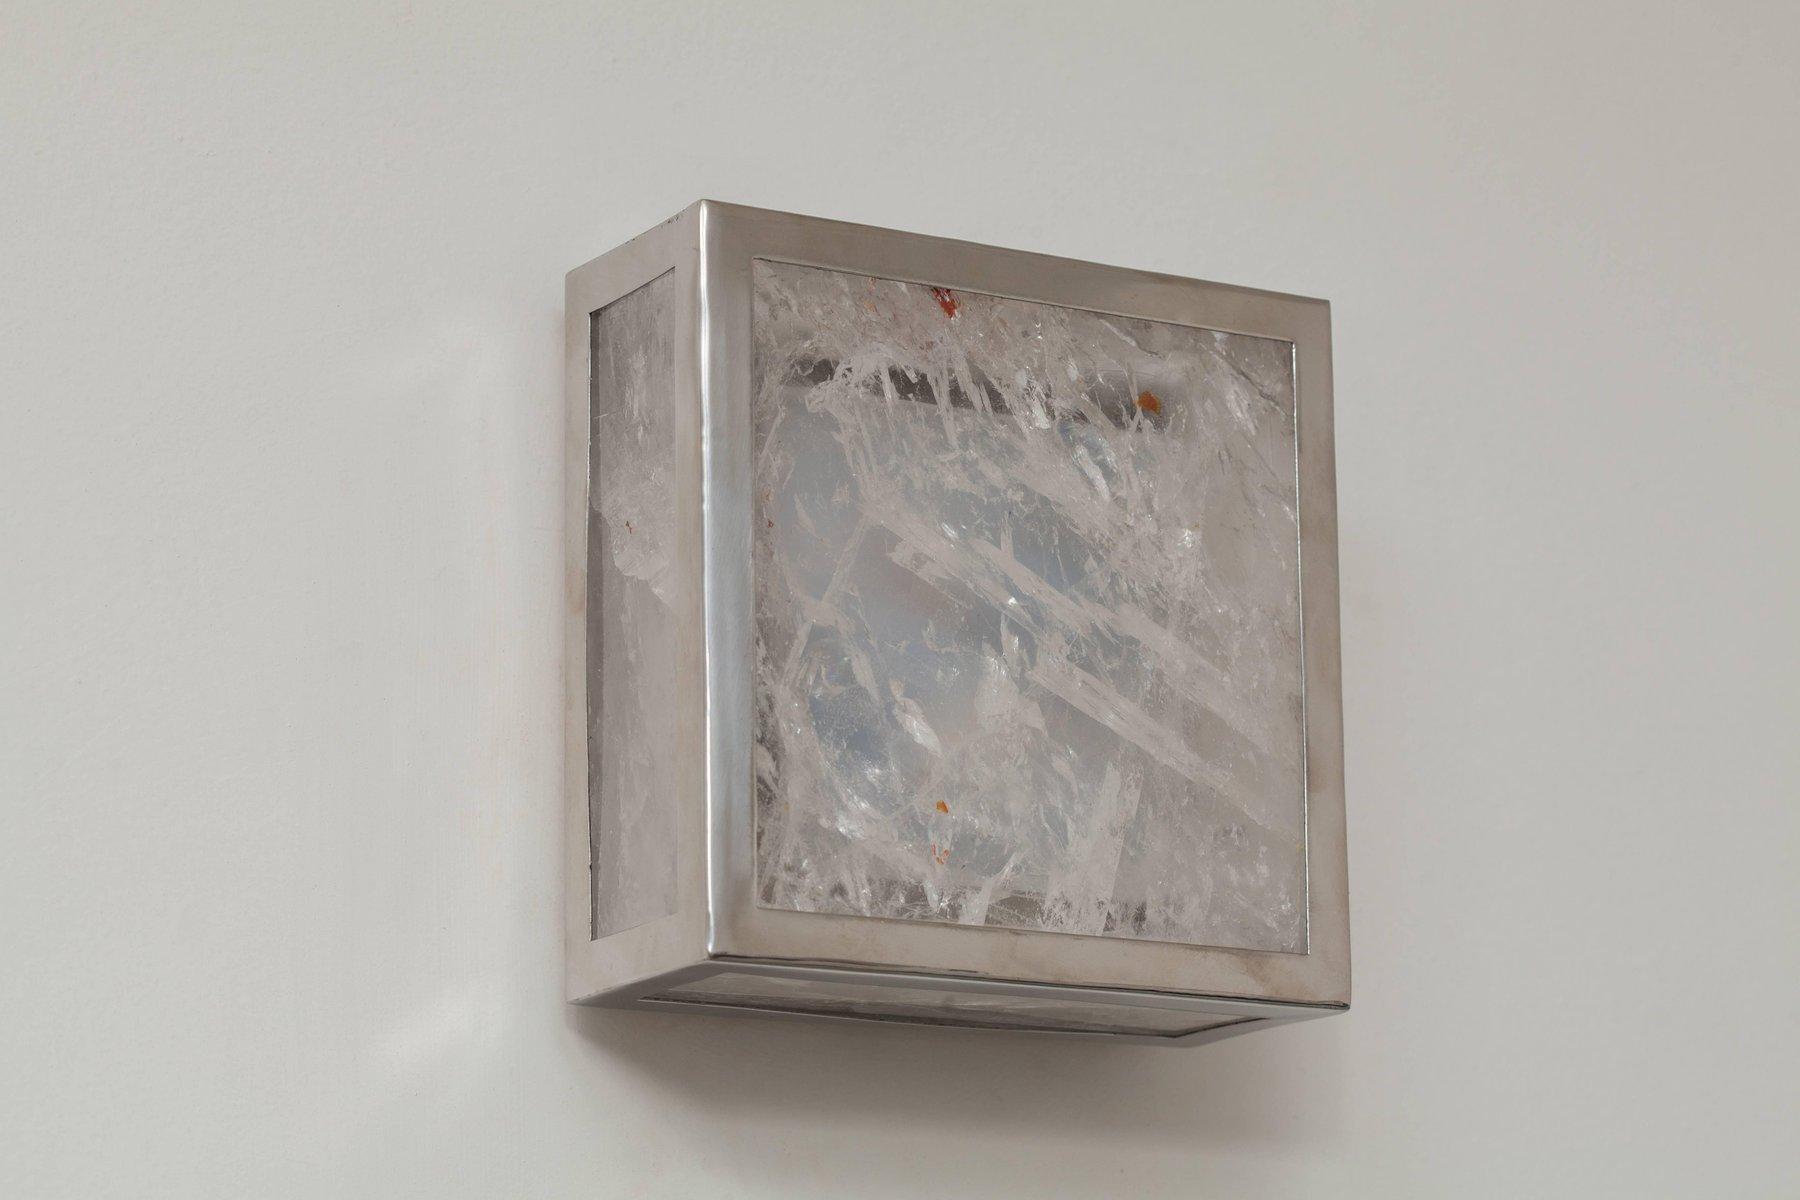 Classic Cube Wandlampen aus Kristallglas & Fels von Demian Quincke, 2e...